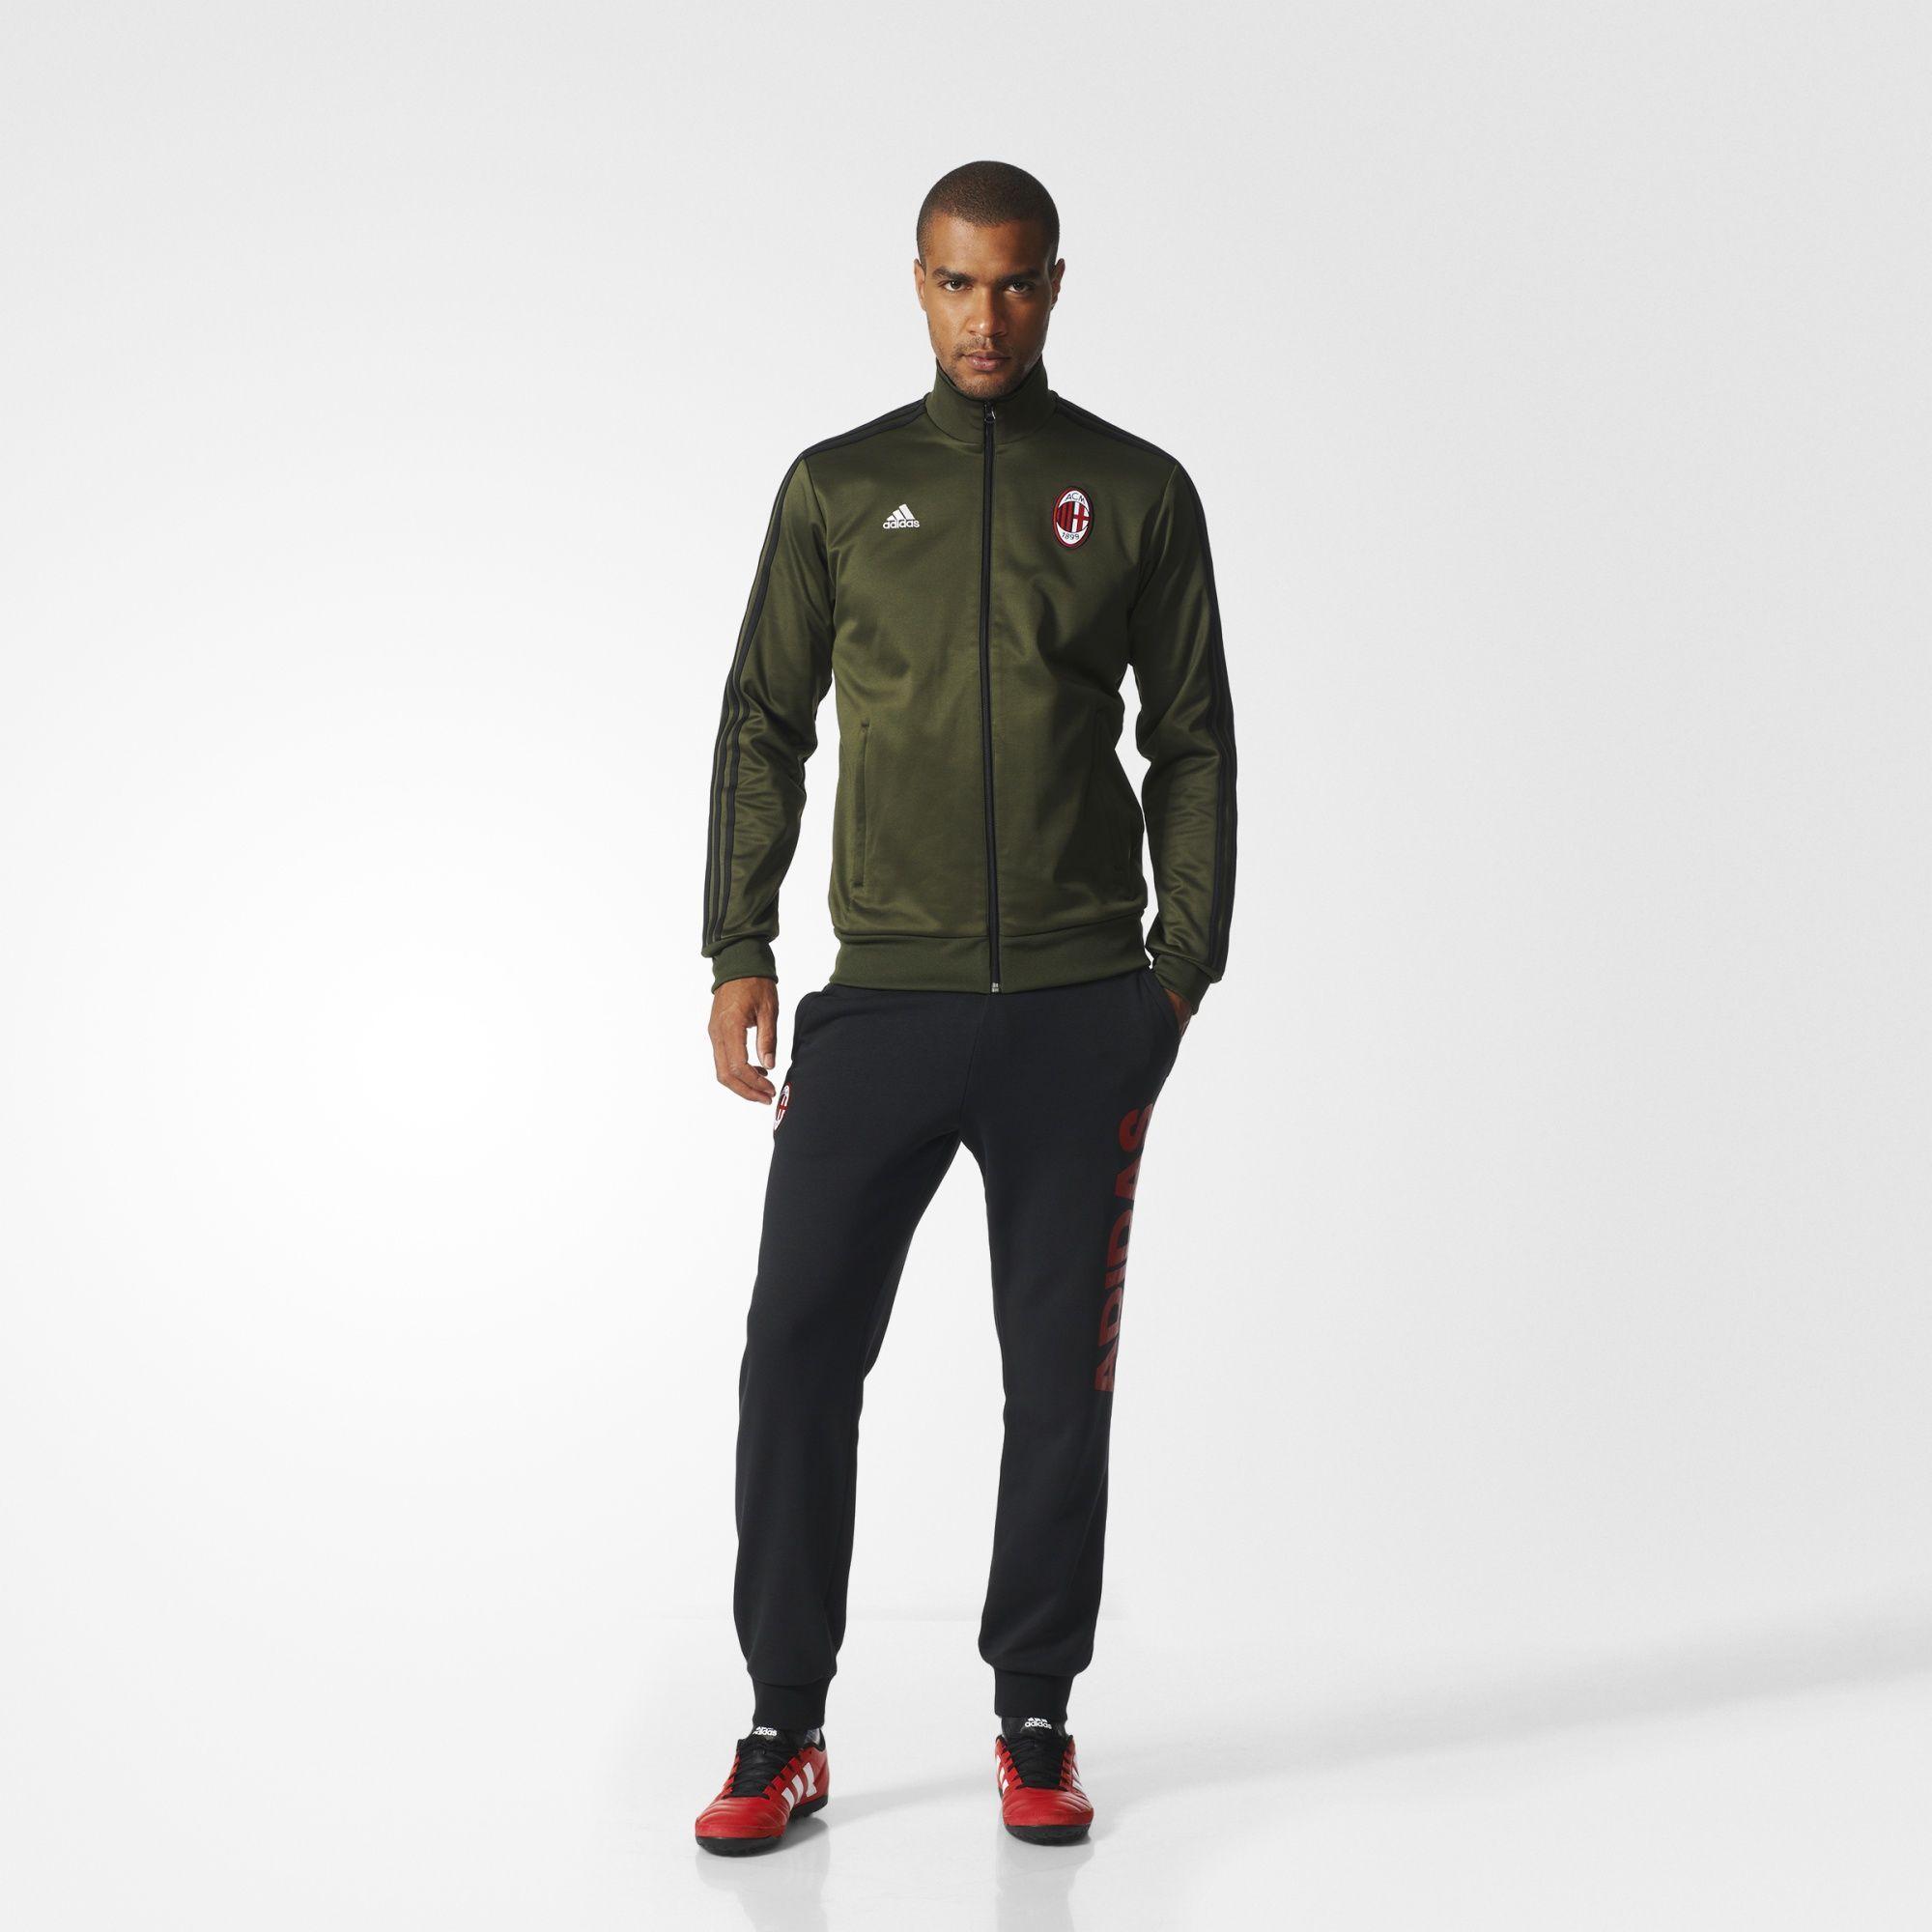 5f07d4e83e adidas - AC Milan 3-Stripes Track Jacket | Men's Fashion. Sharp ...